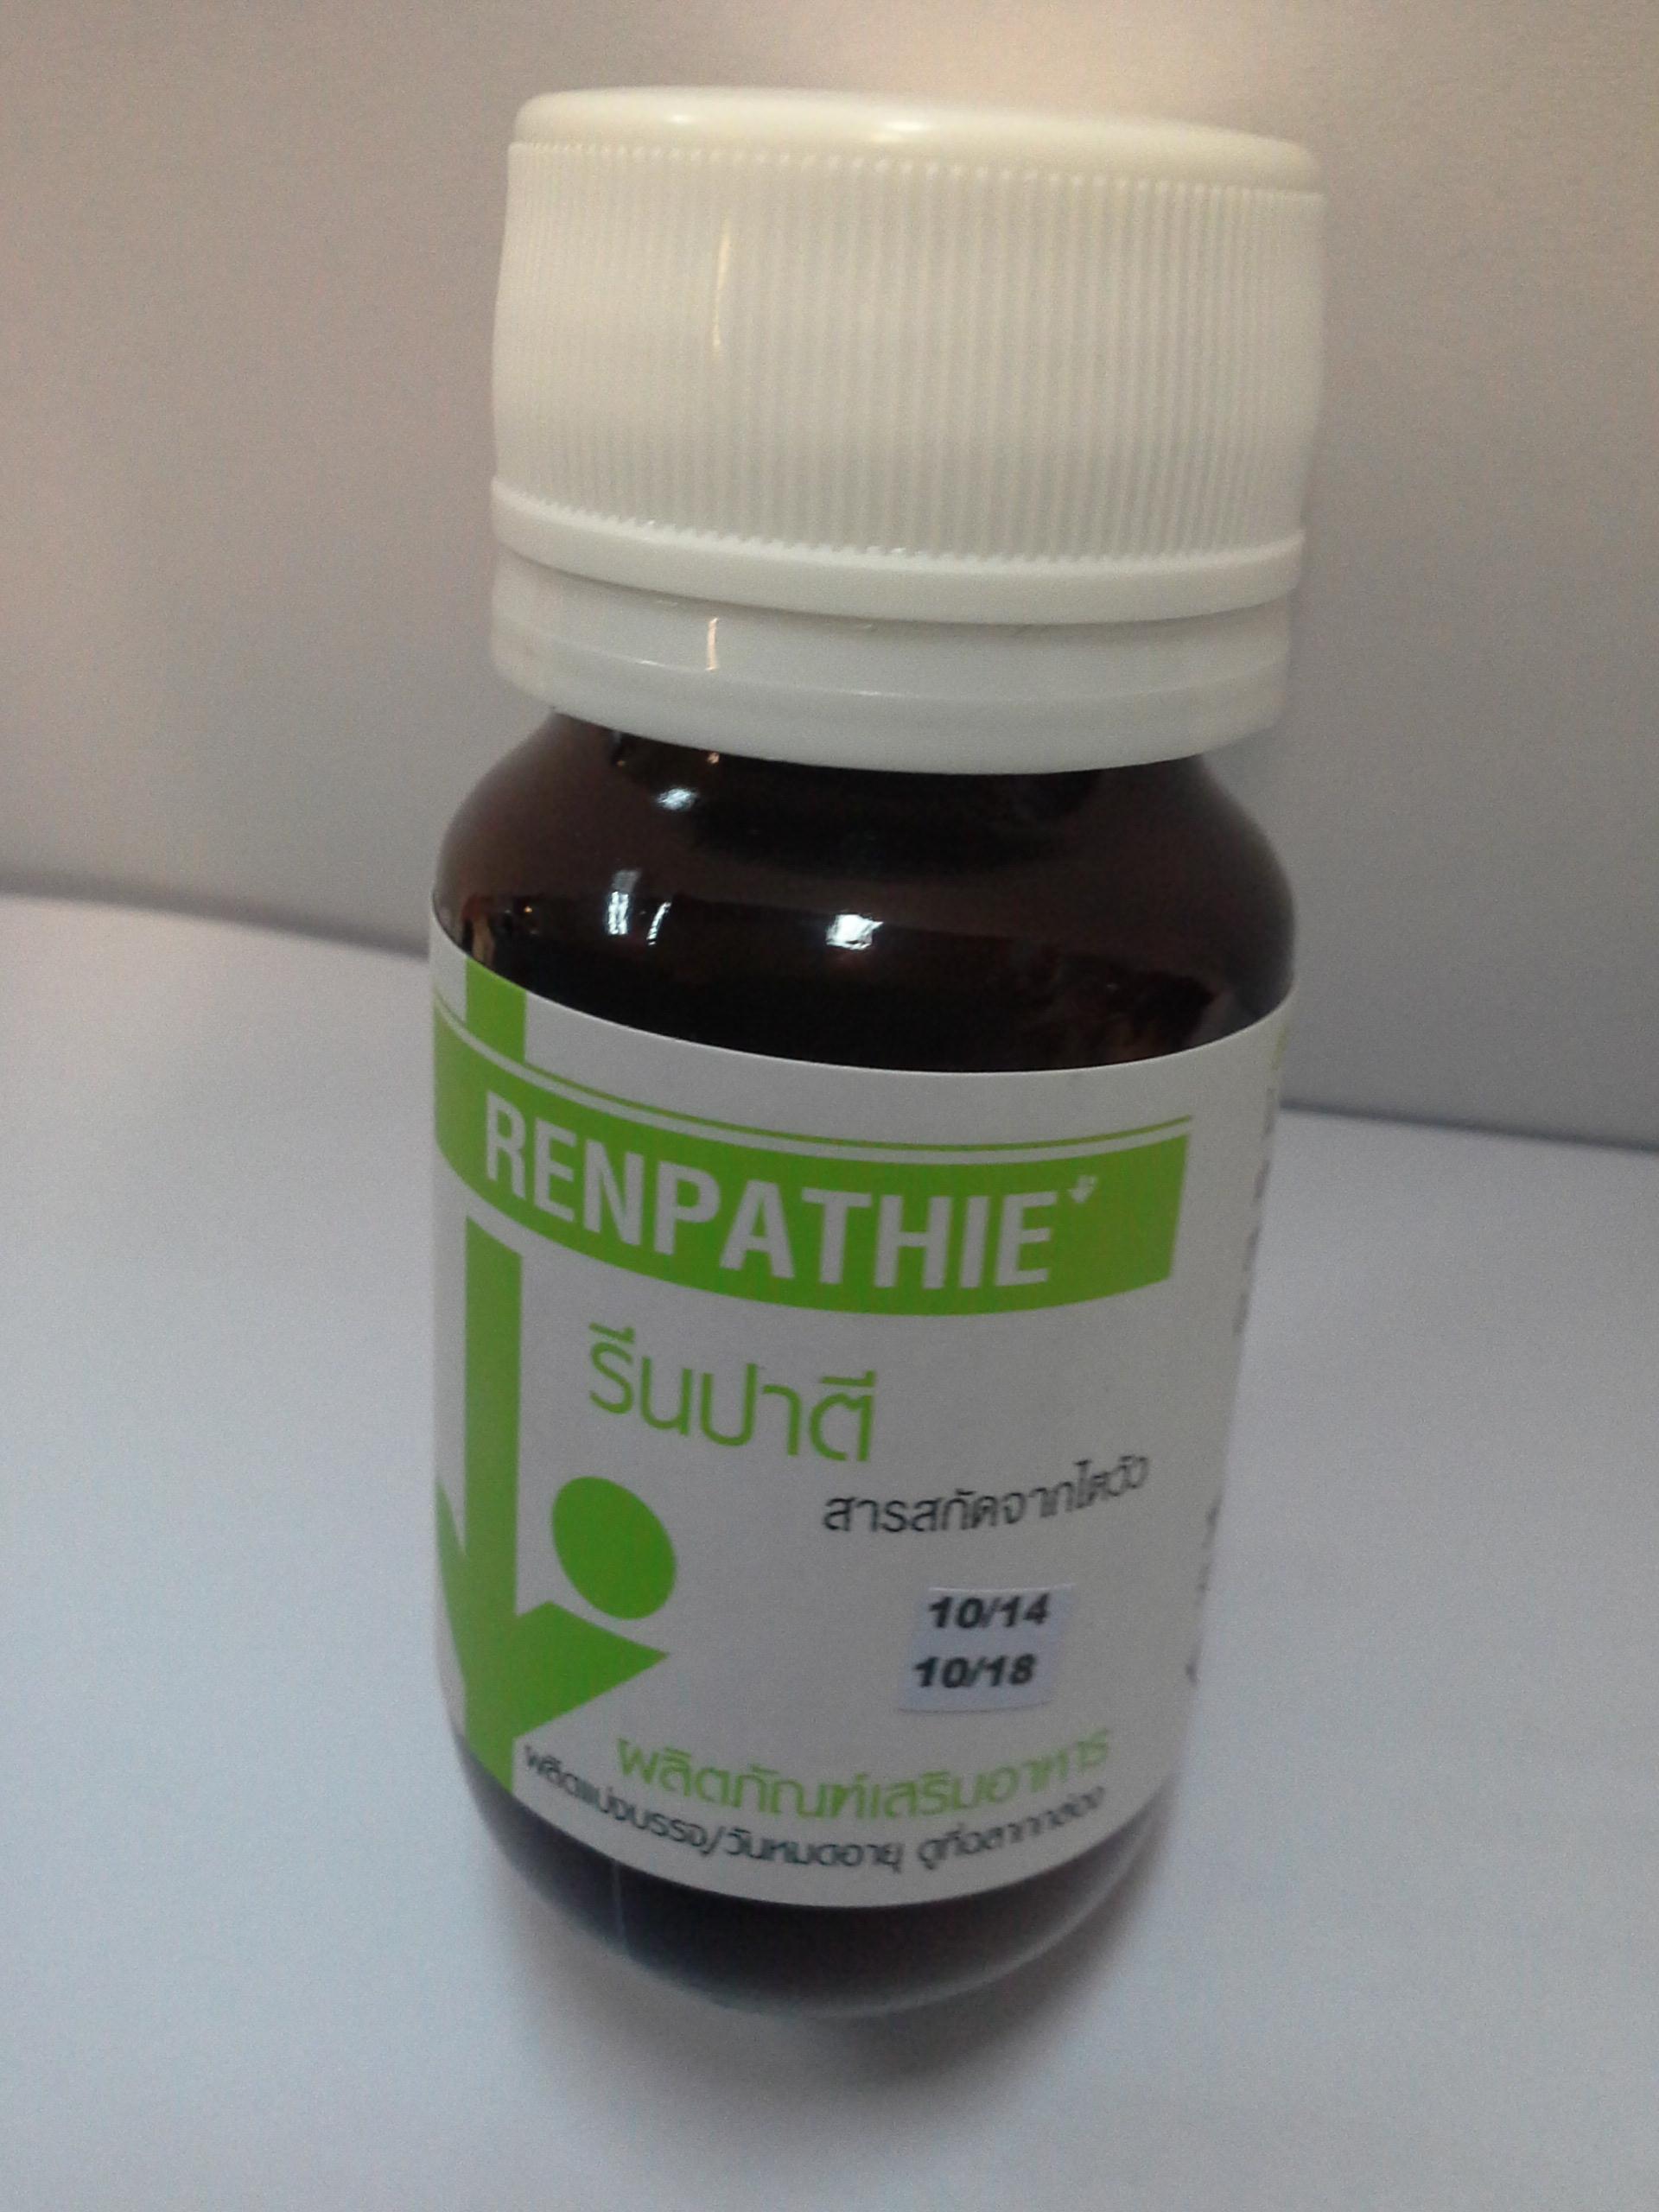 RENPATHIE (รีนปาตี) สารสกัดจากไตวัว